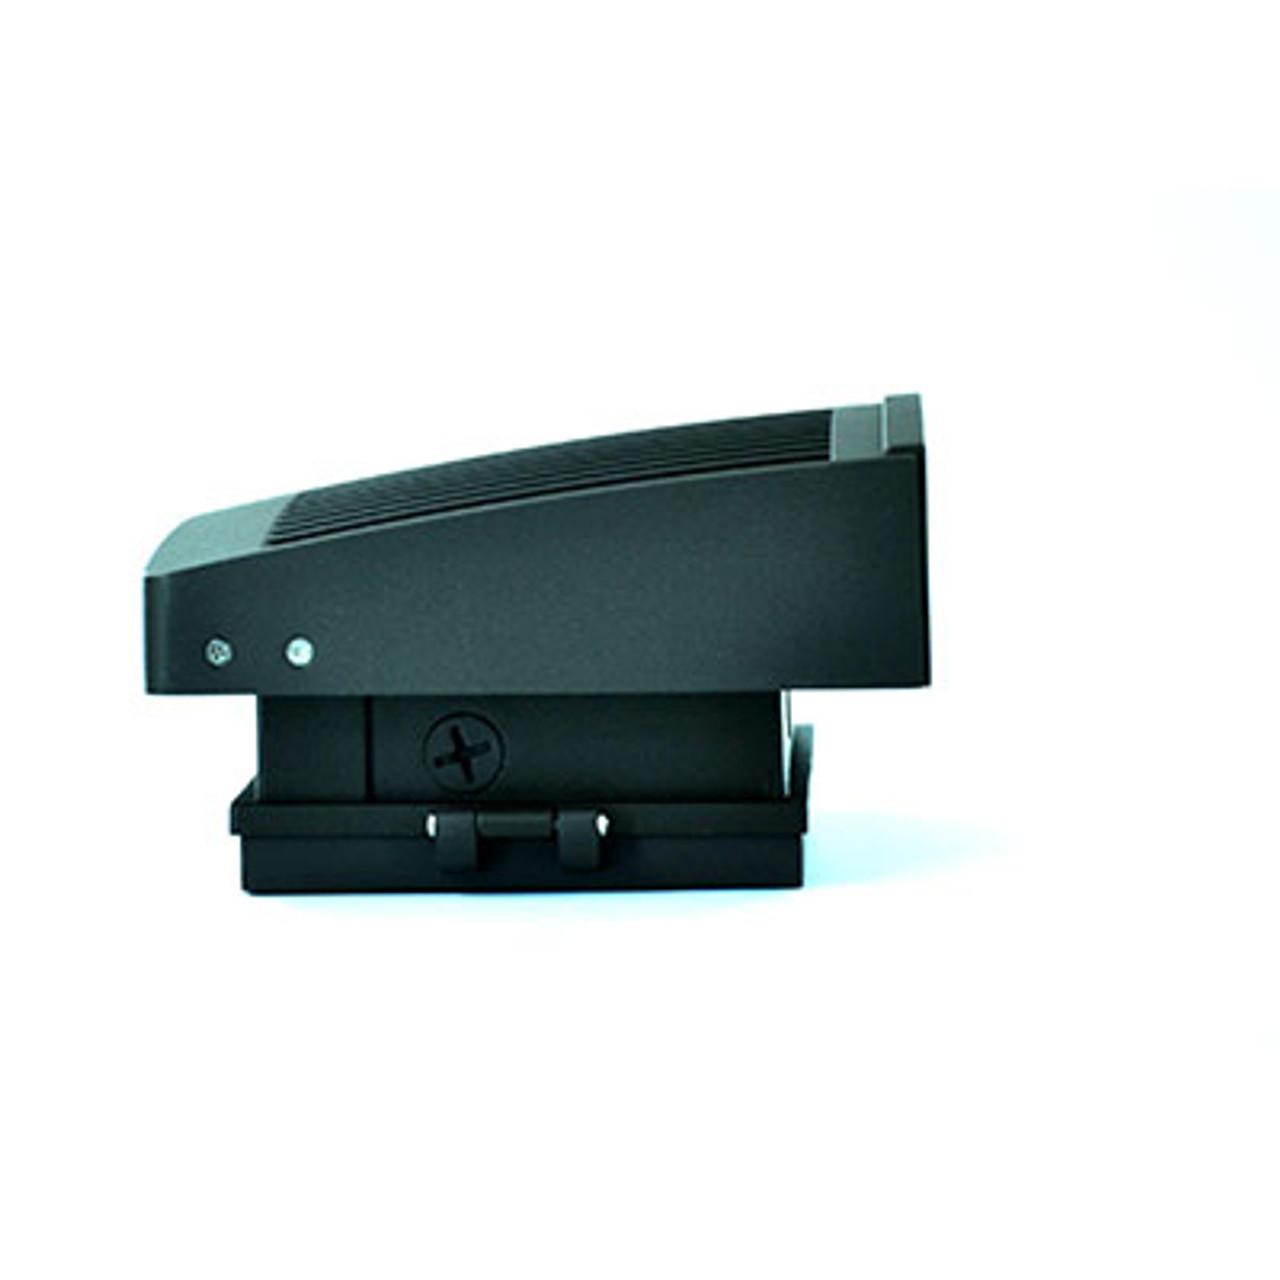 55 Watt LED Wall Pack - 200W HPS/MH Equivalent